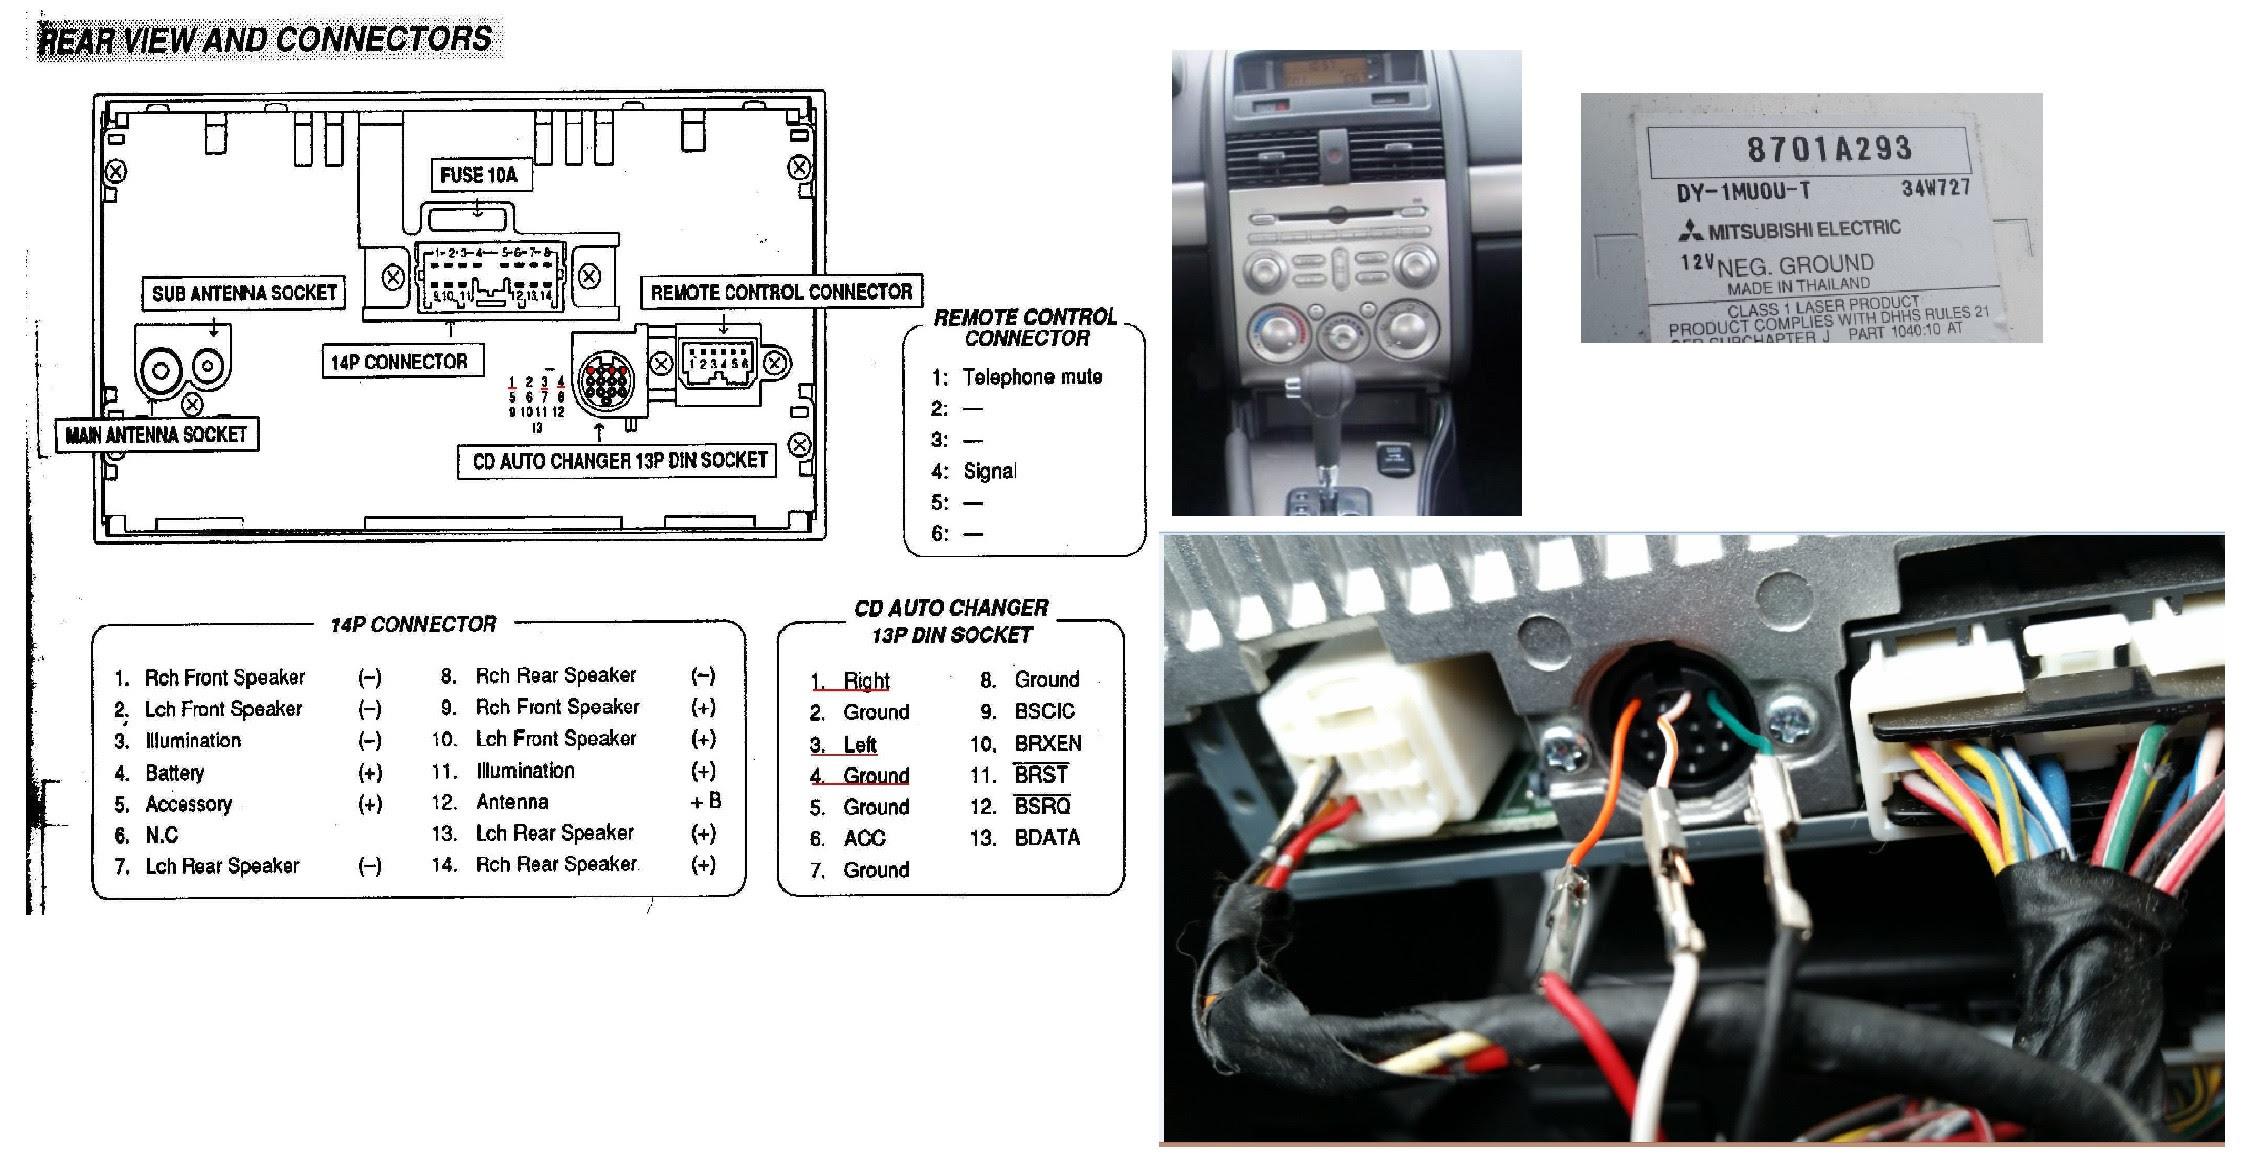 Diagram Mitsubishi Asx 2014 Wiring Diagram Full Version Hd Quality Wiring Diagram Thebpguide Scarpeskecherssport It